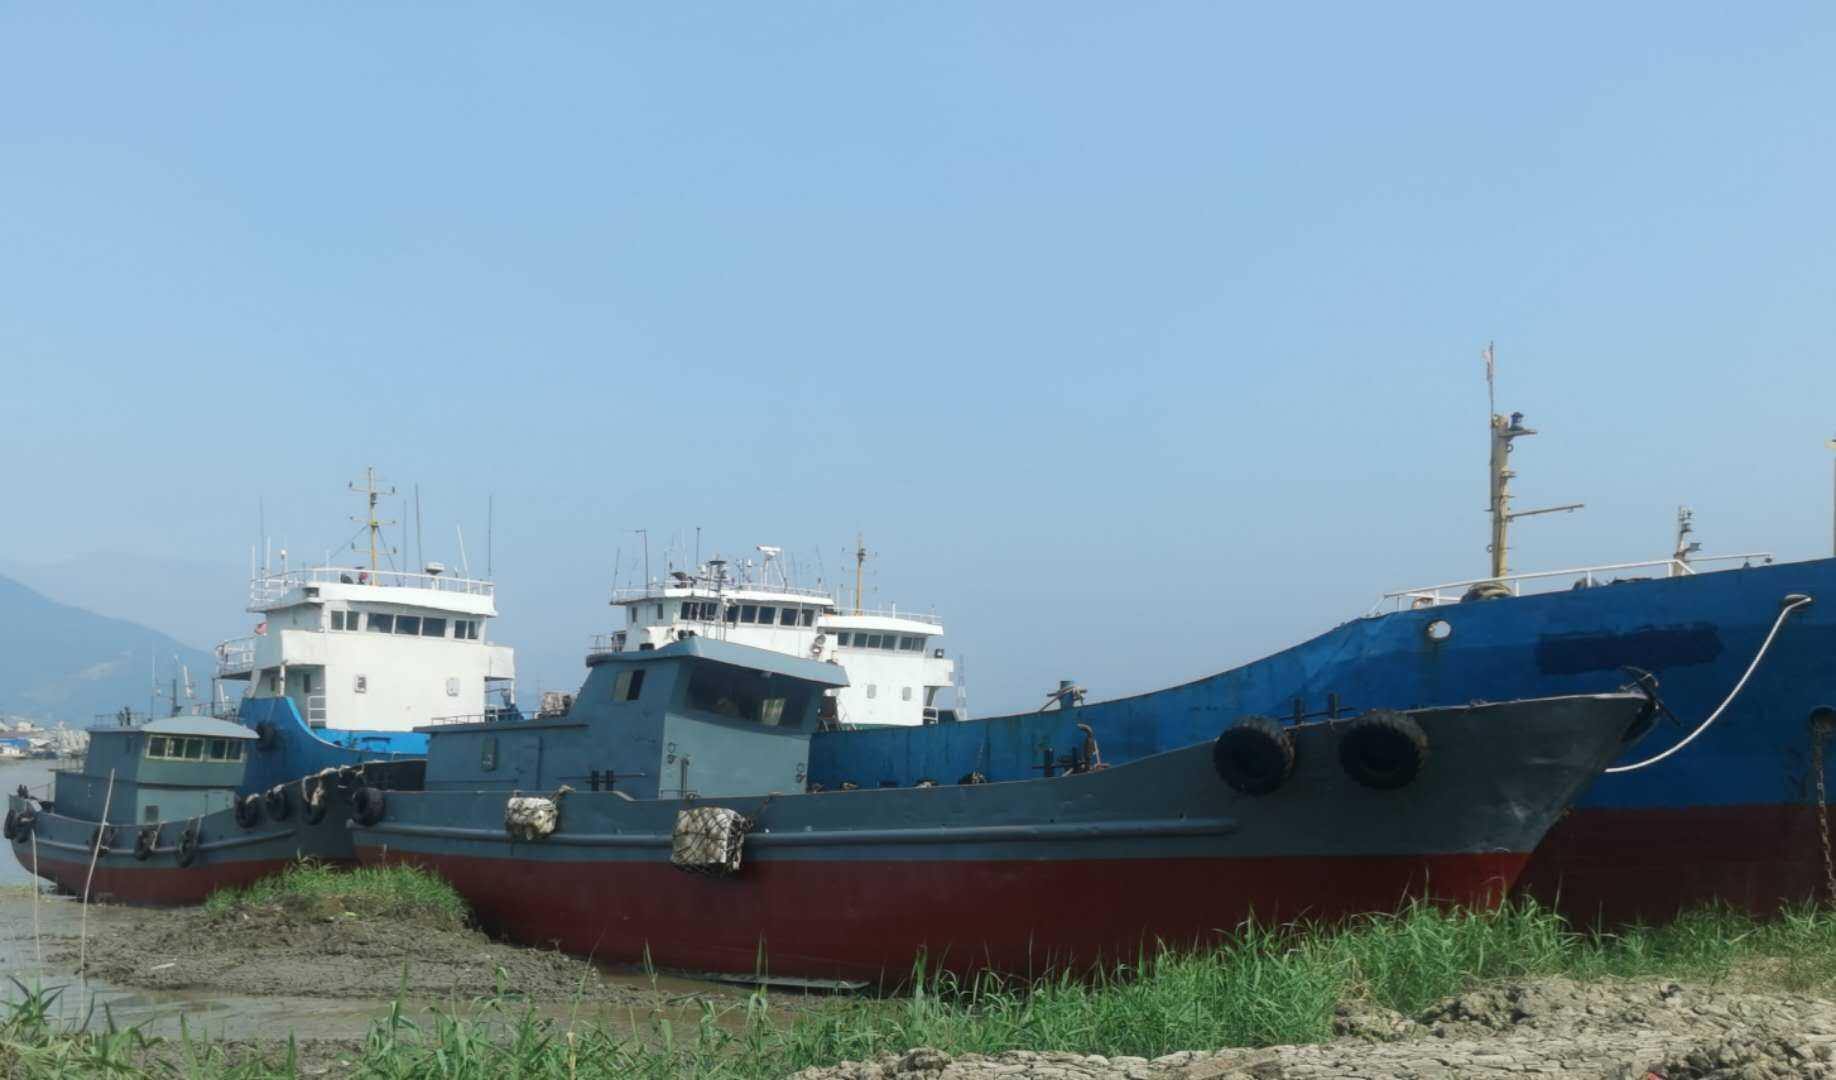 160油船